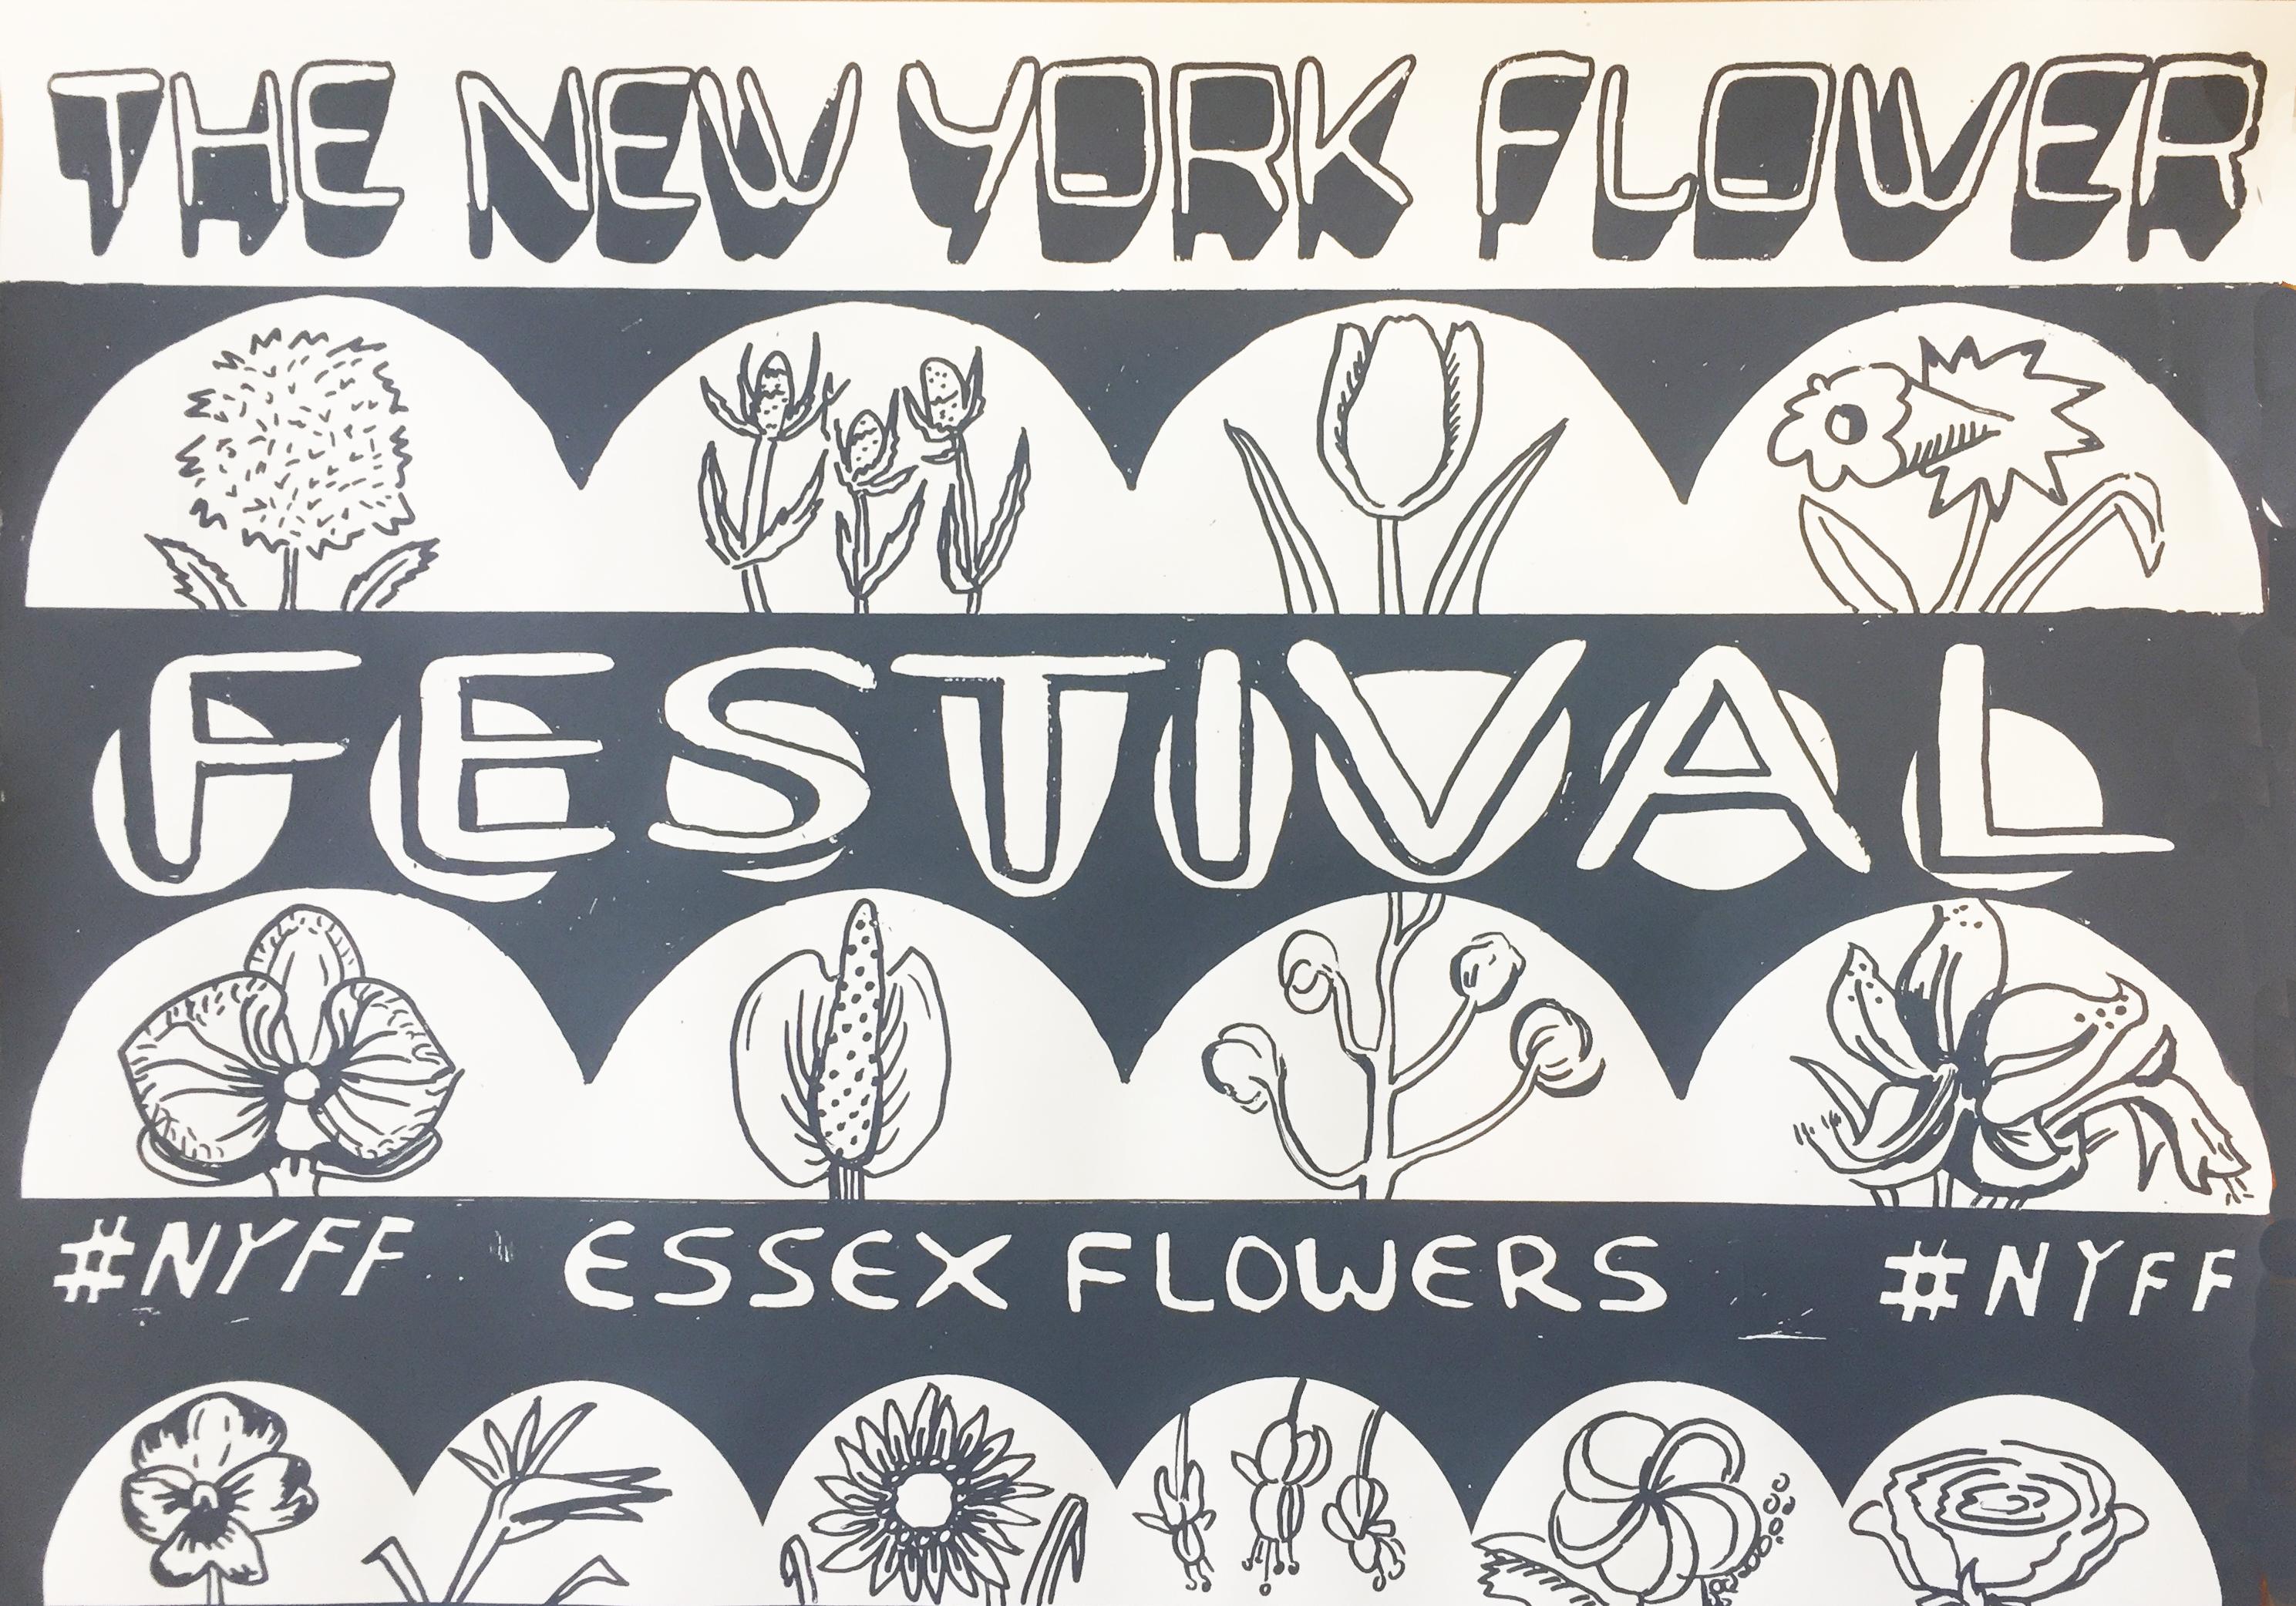 New York Flower Festival 2018 Essex Flowers